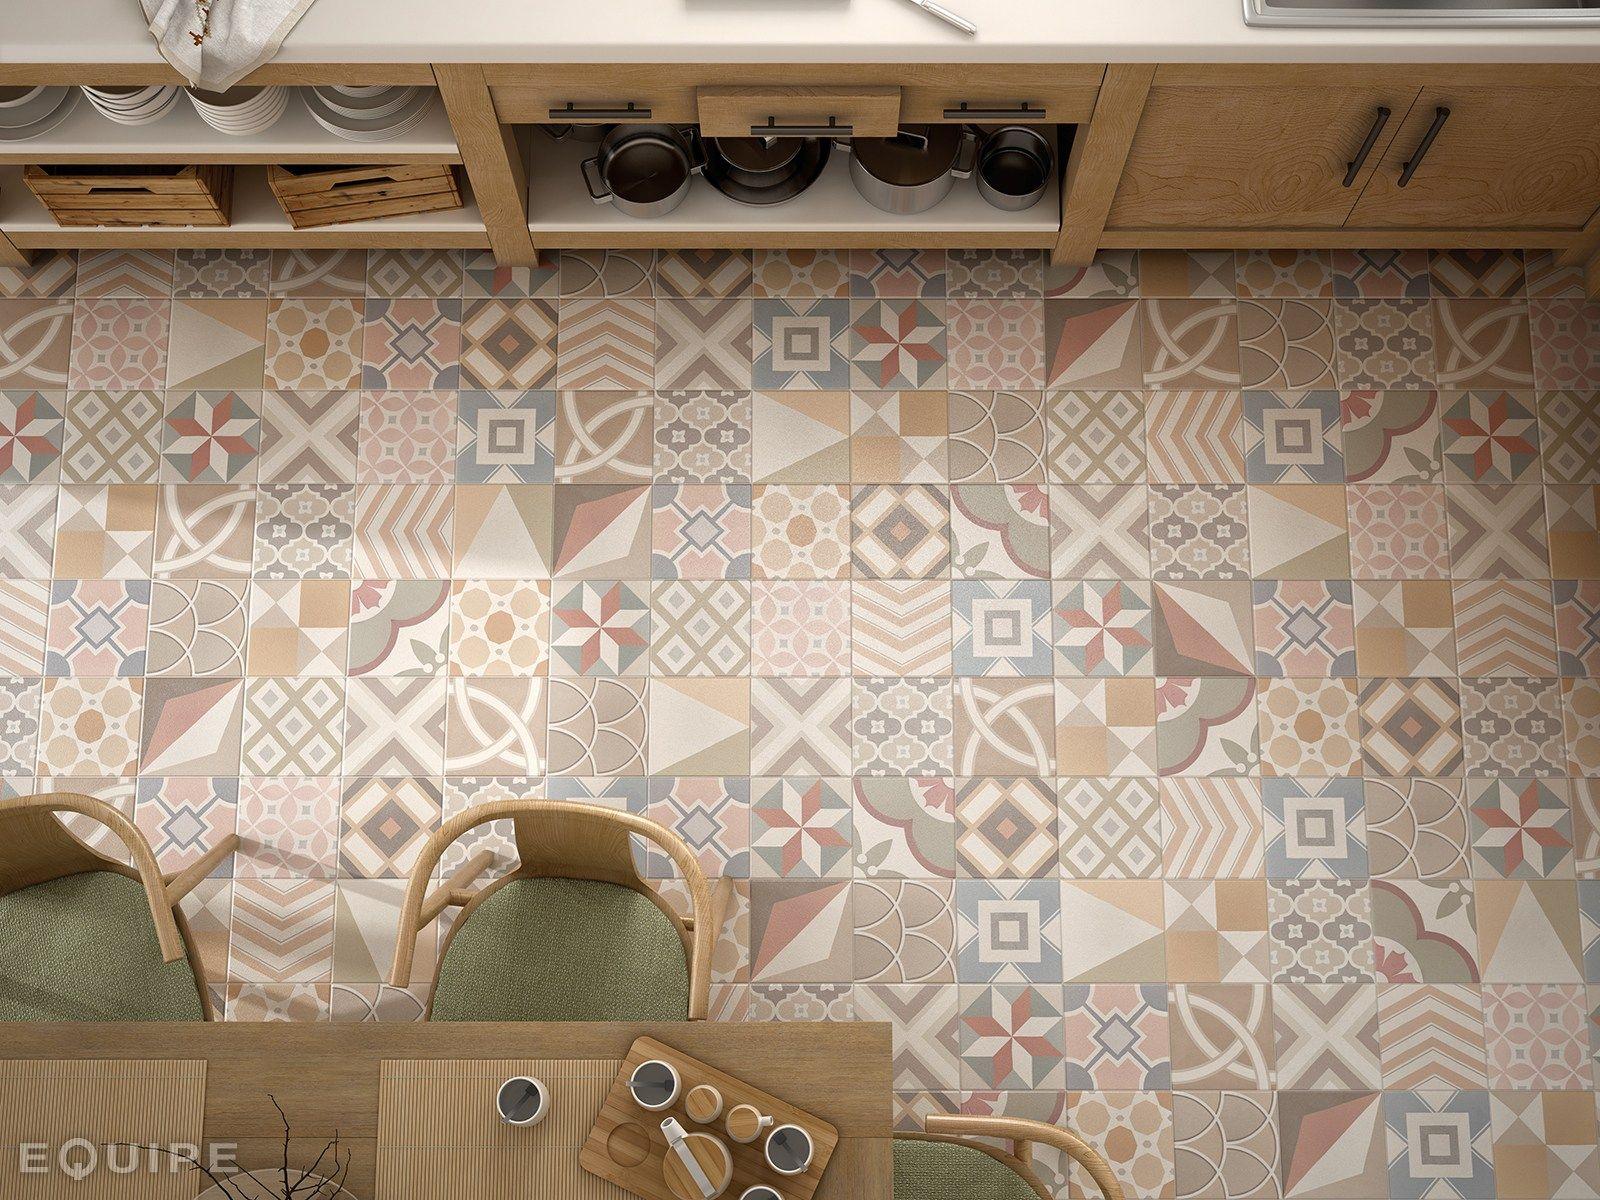 pavimento rivestimento in ceramica caprice deco by equipe. Black Bedroom Furniture Sets. Home Design Ideas